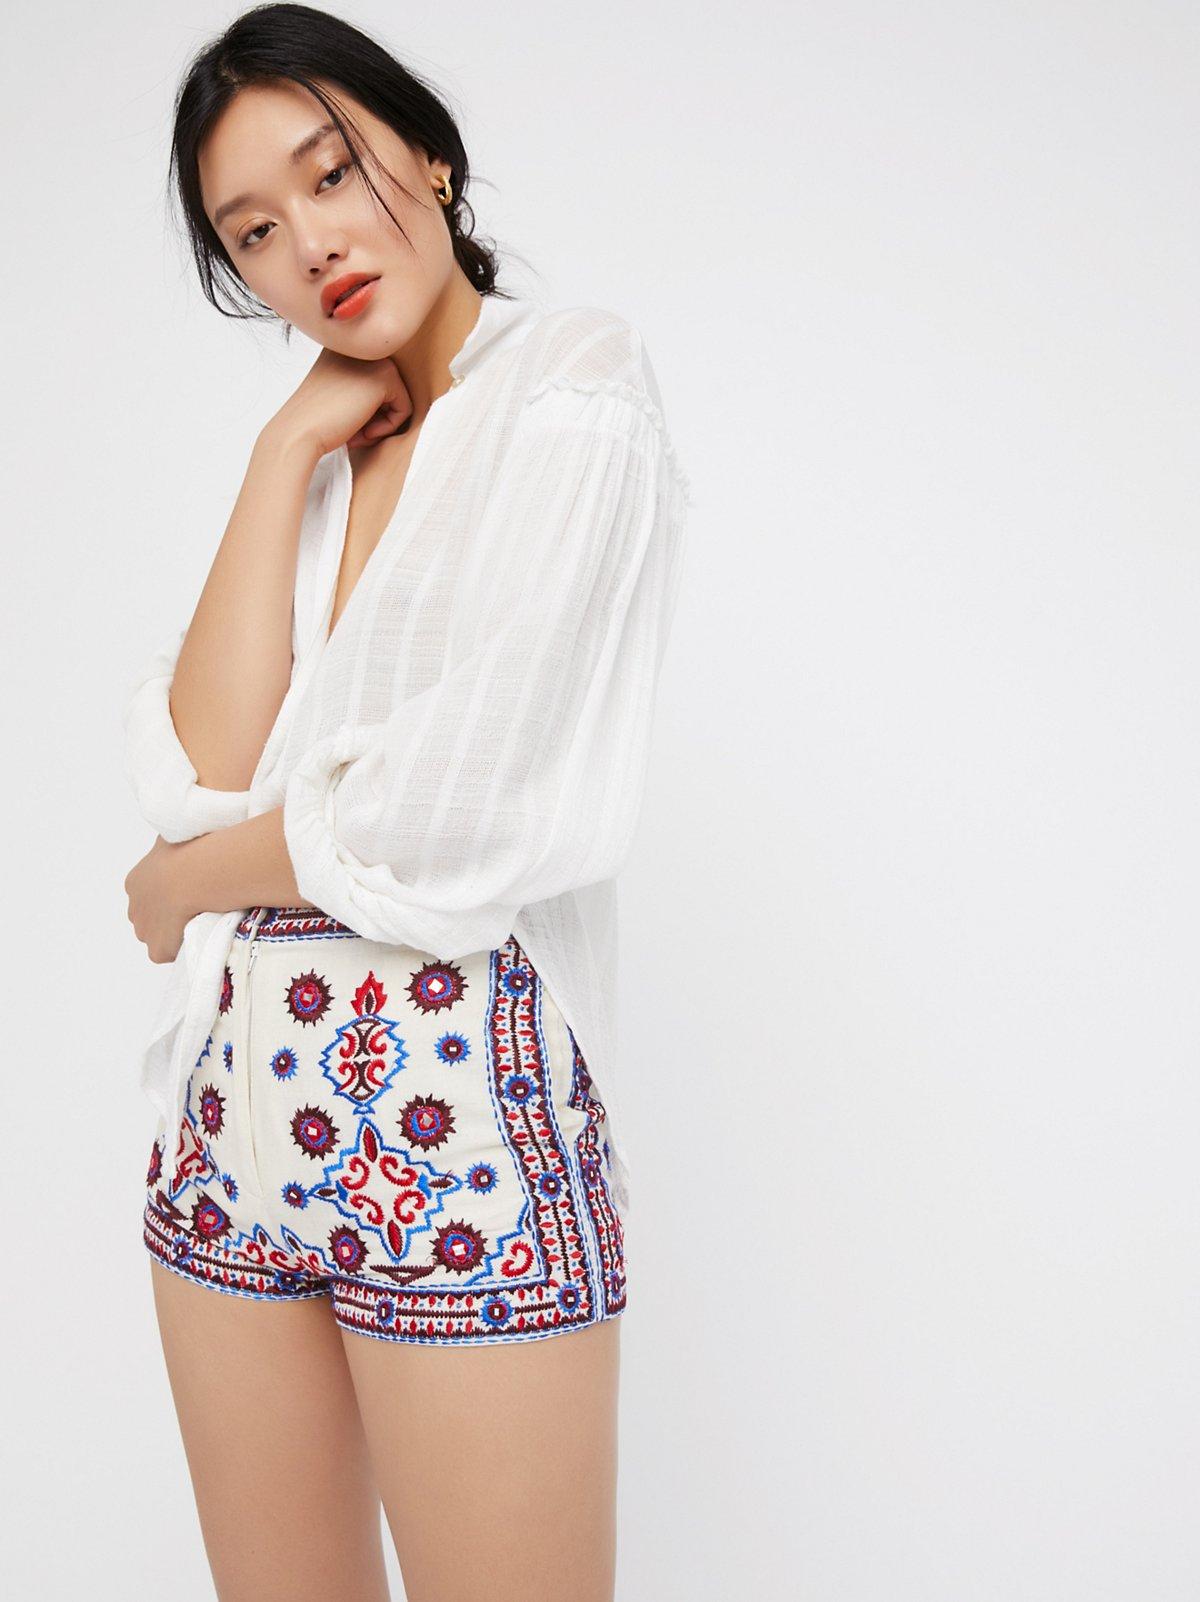 Kozmic Daze装饰短裤